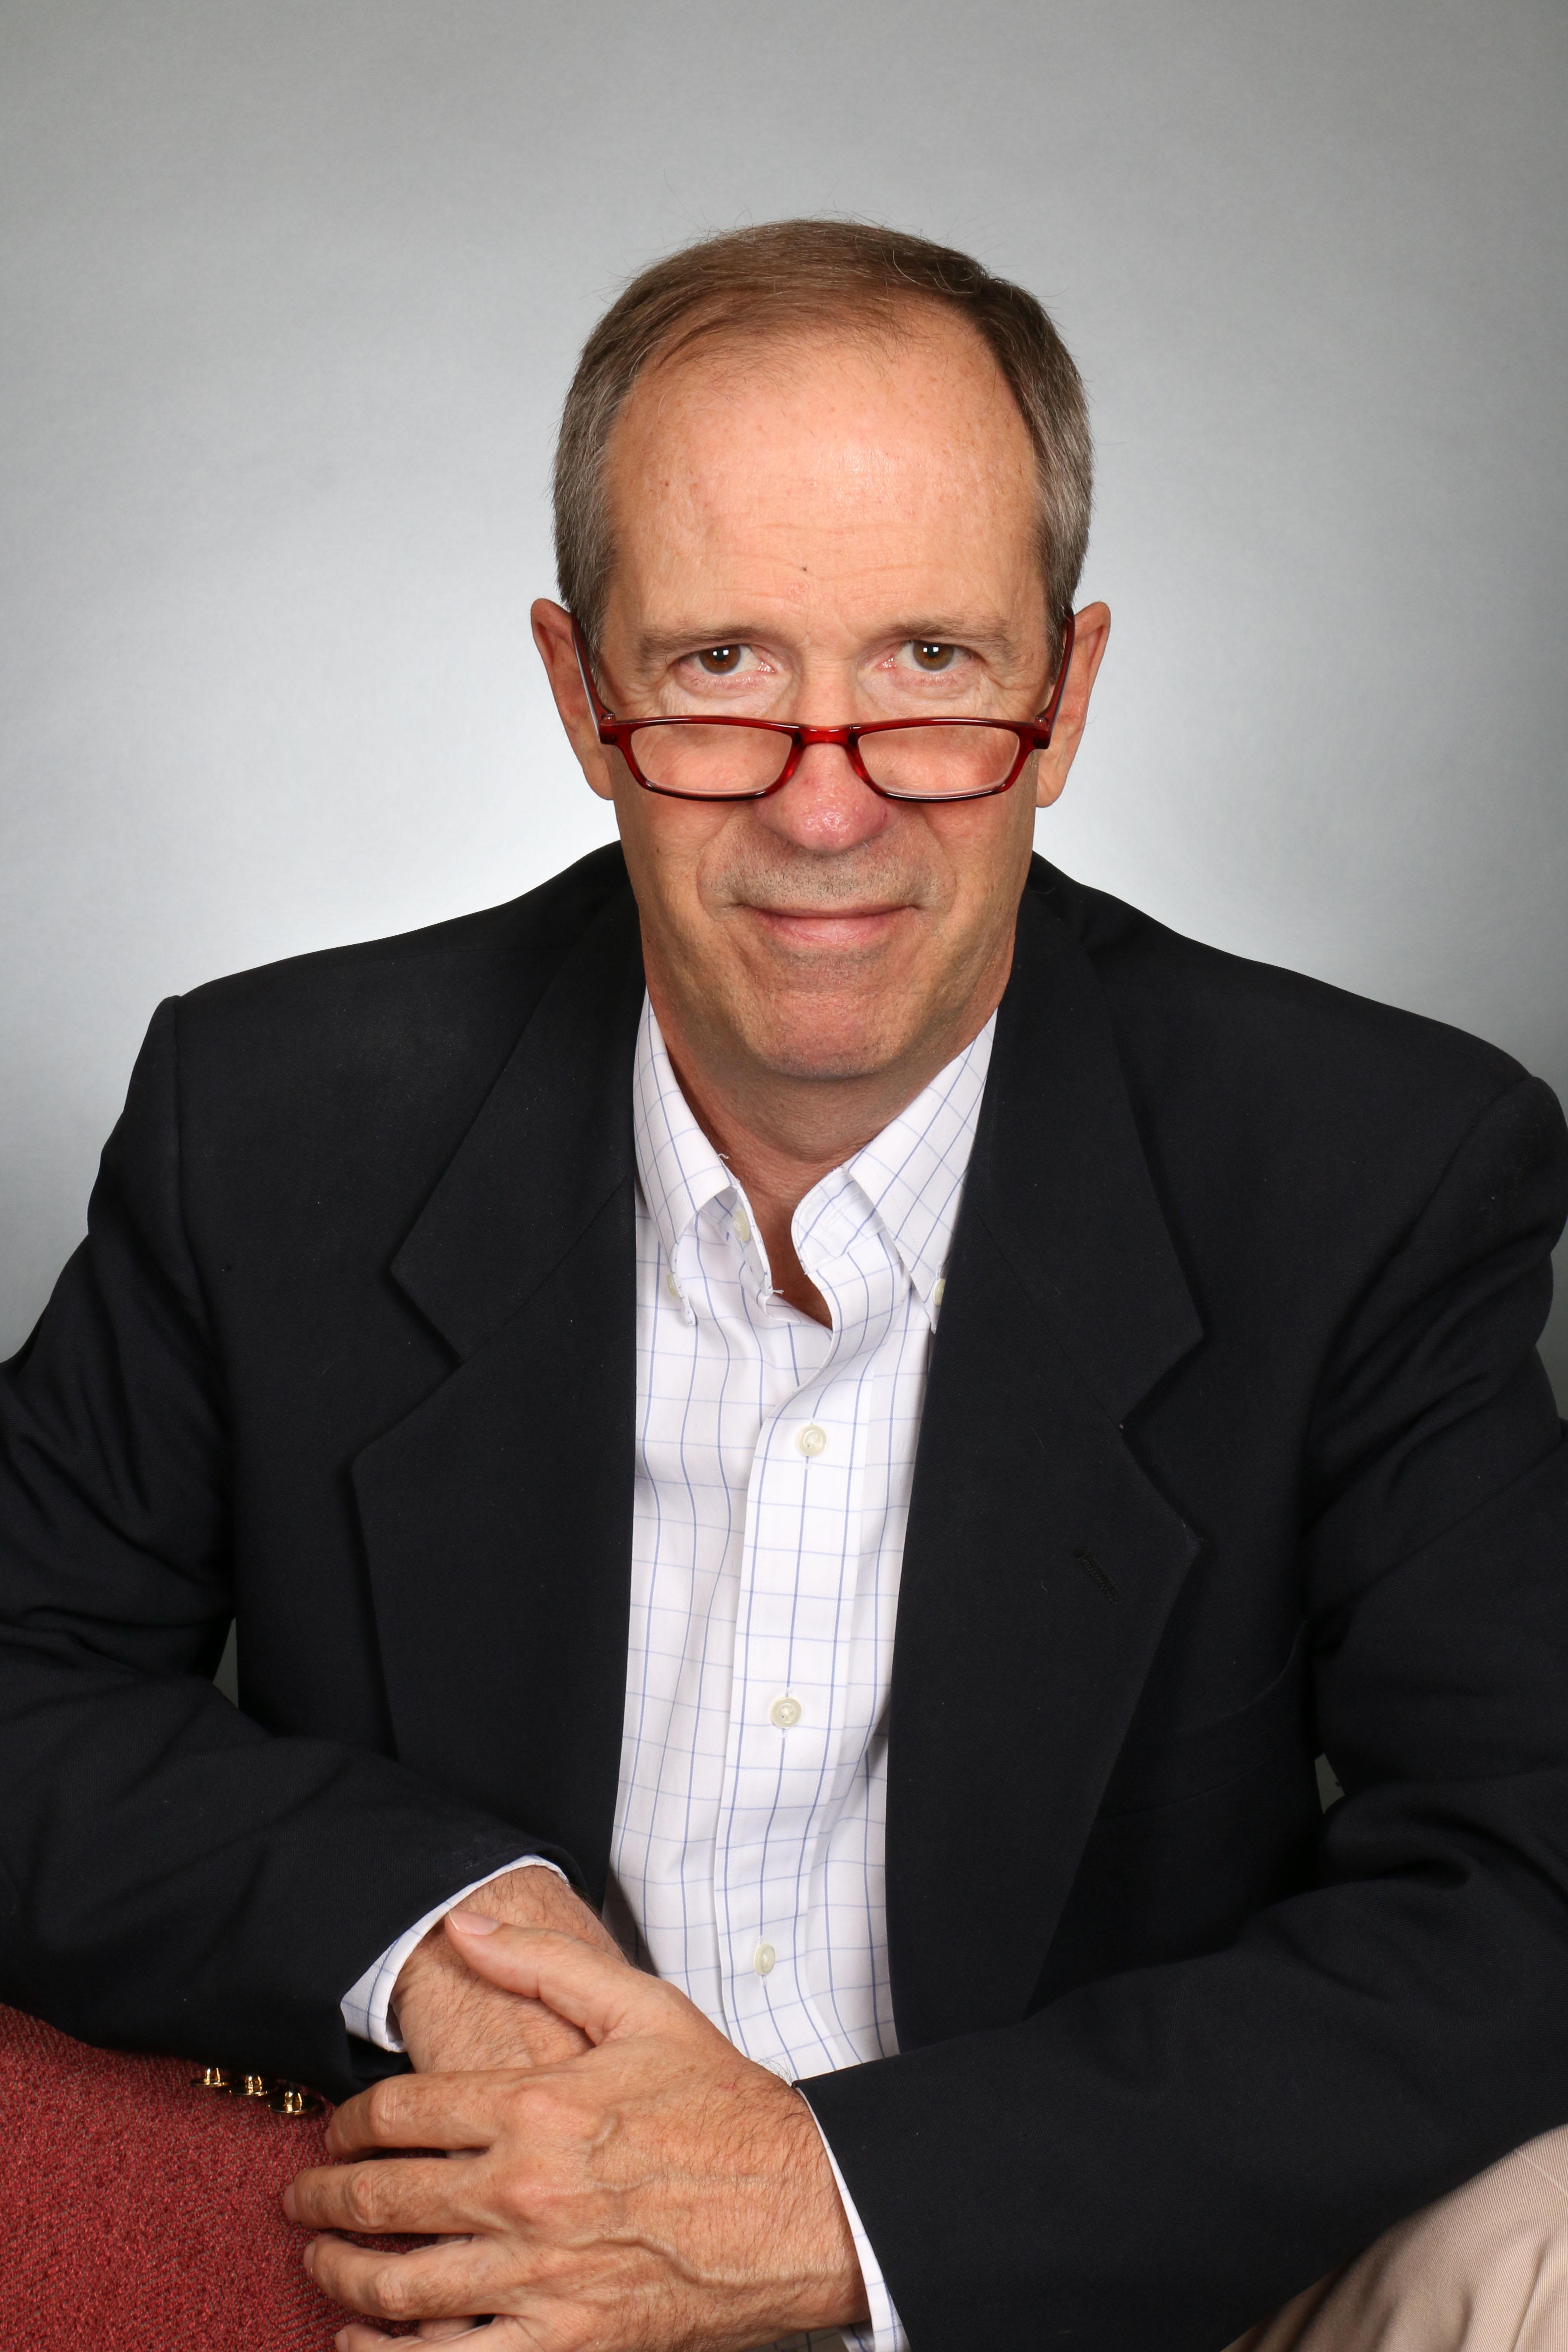 Michael M Collie